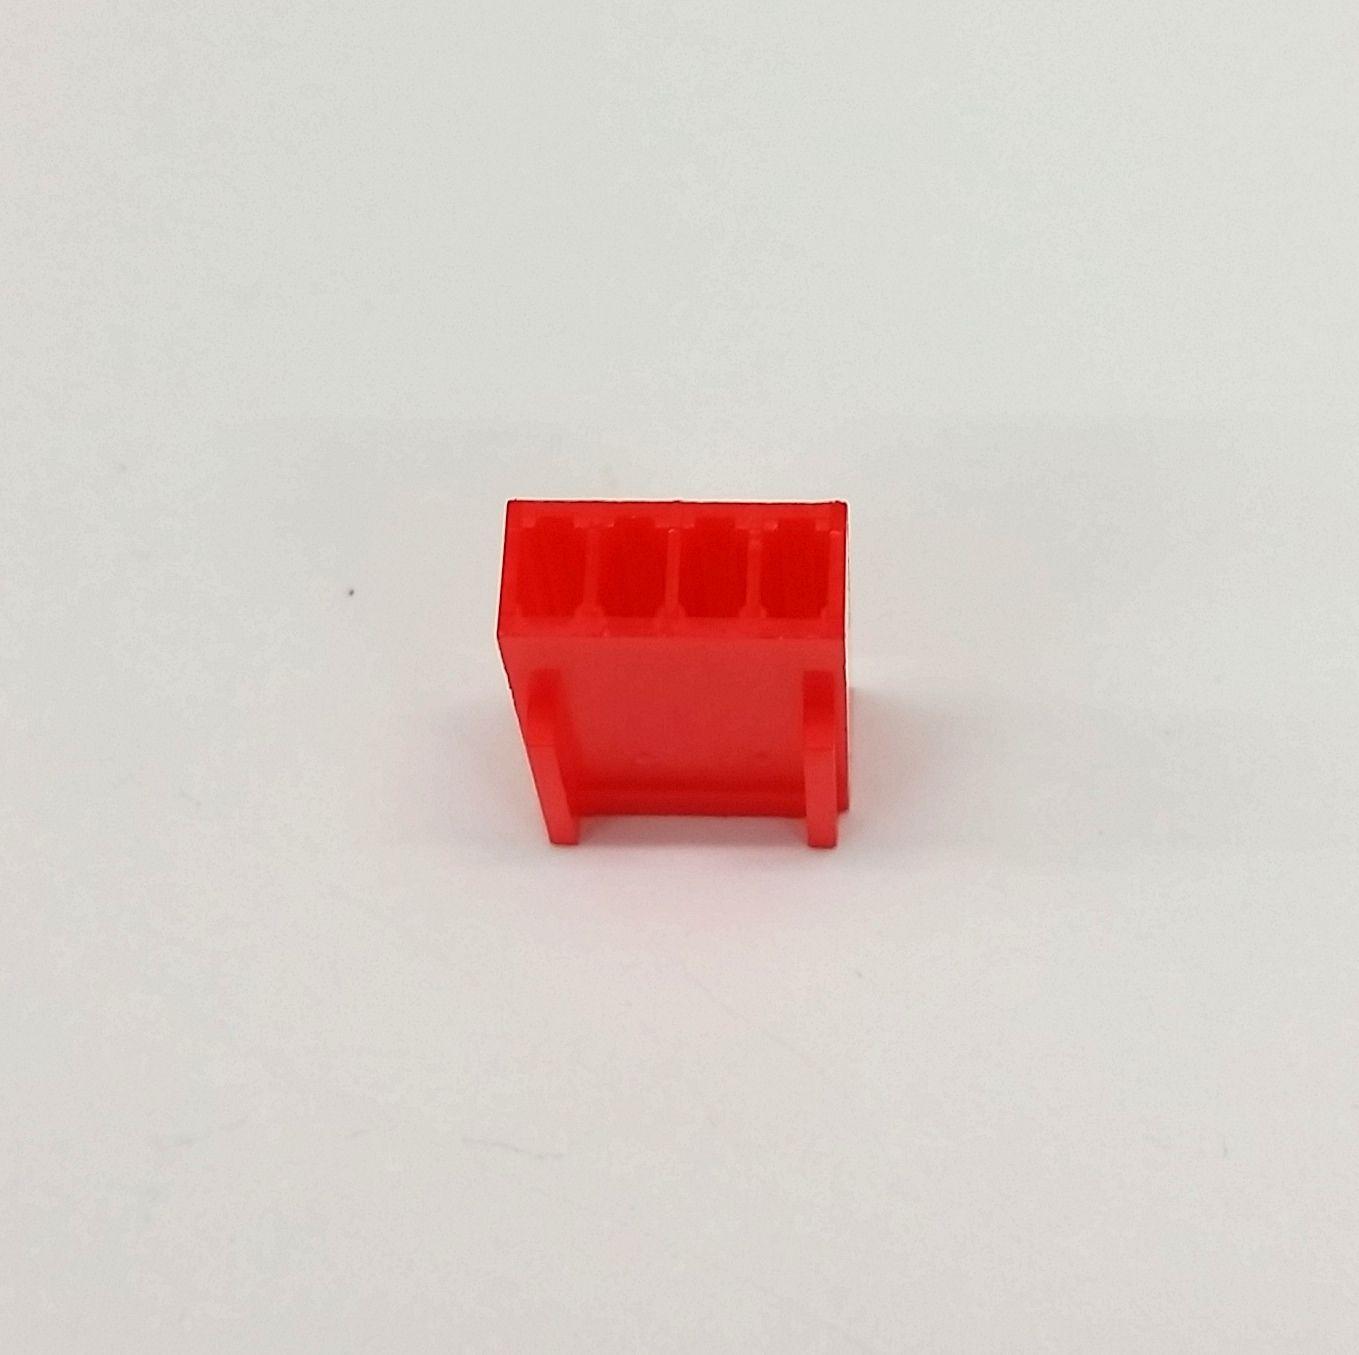 10er Packung - Buchse 4-polig Lüfter Stromanschluss - rot inklusive Pins image 4